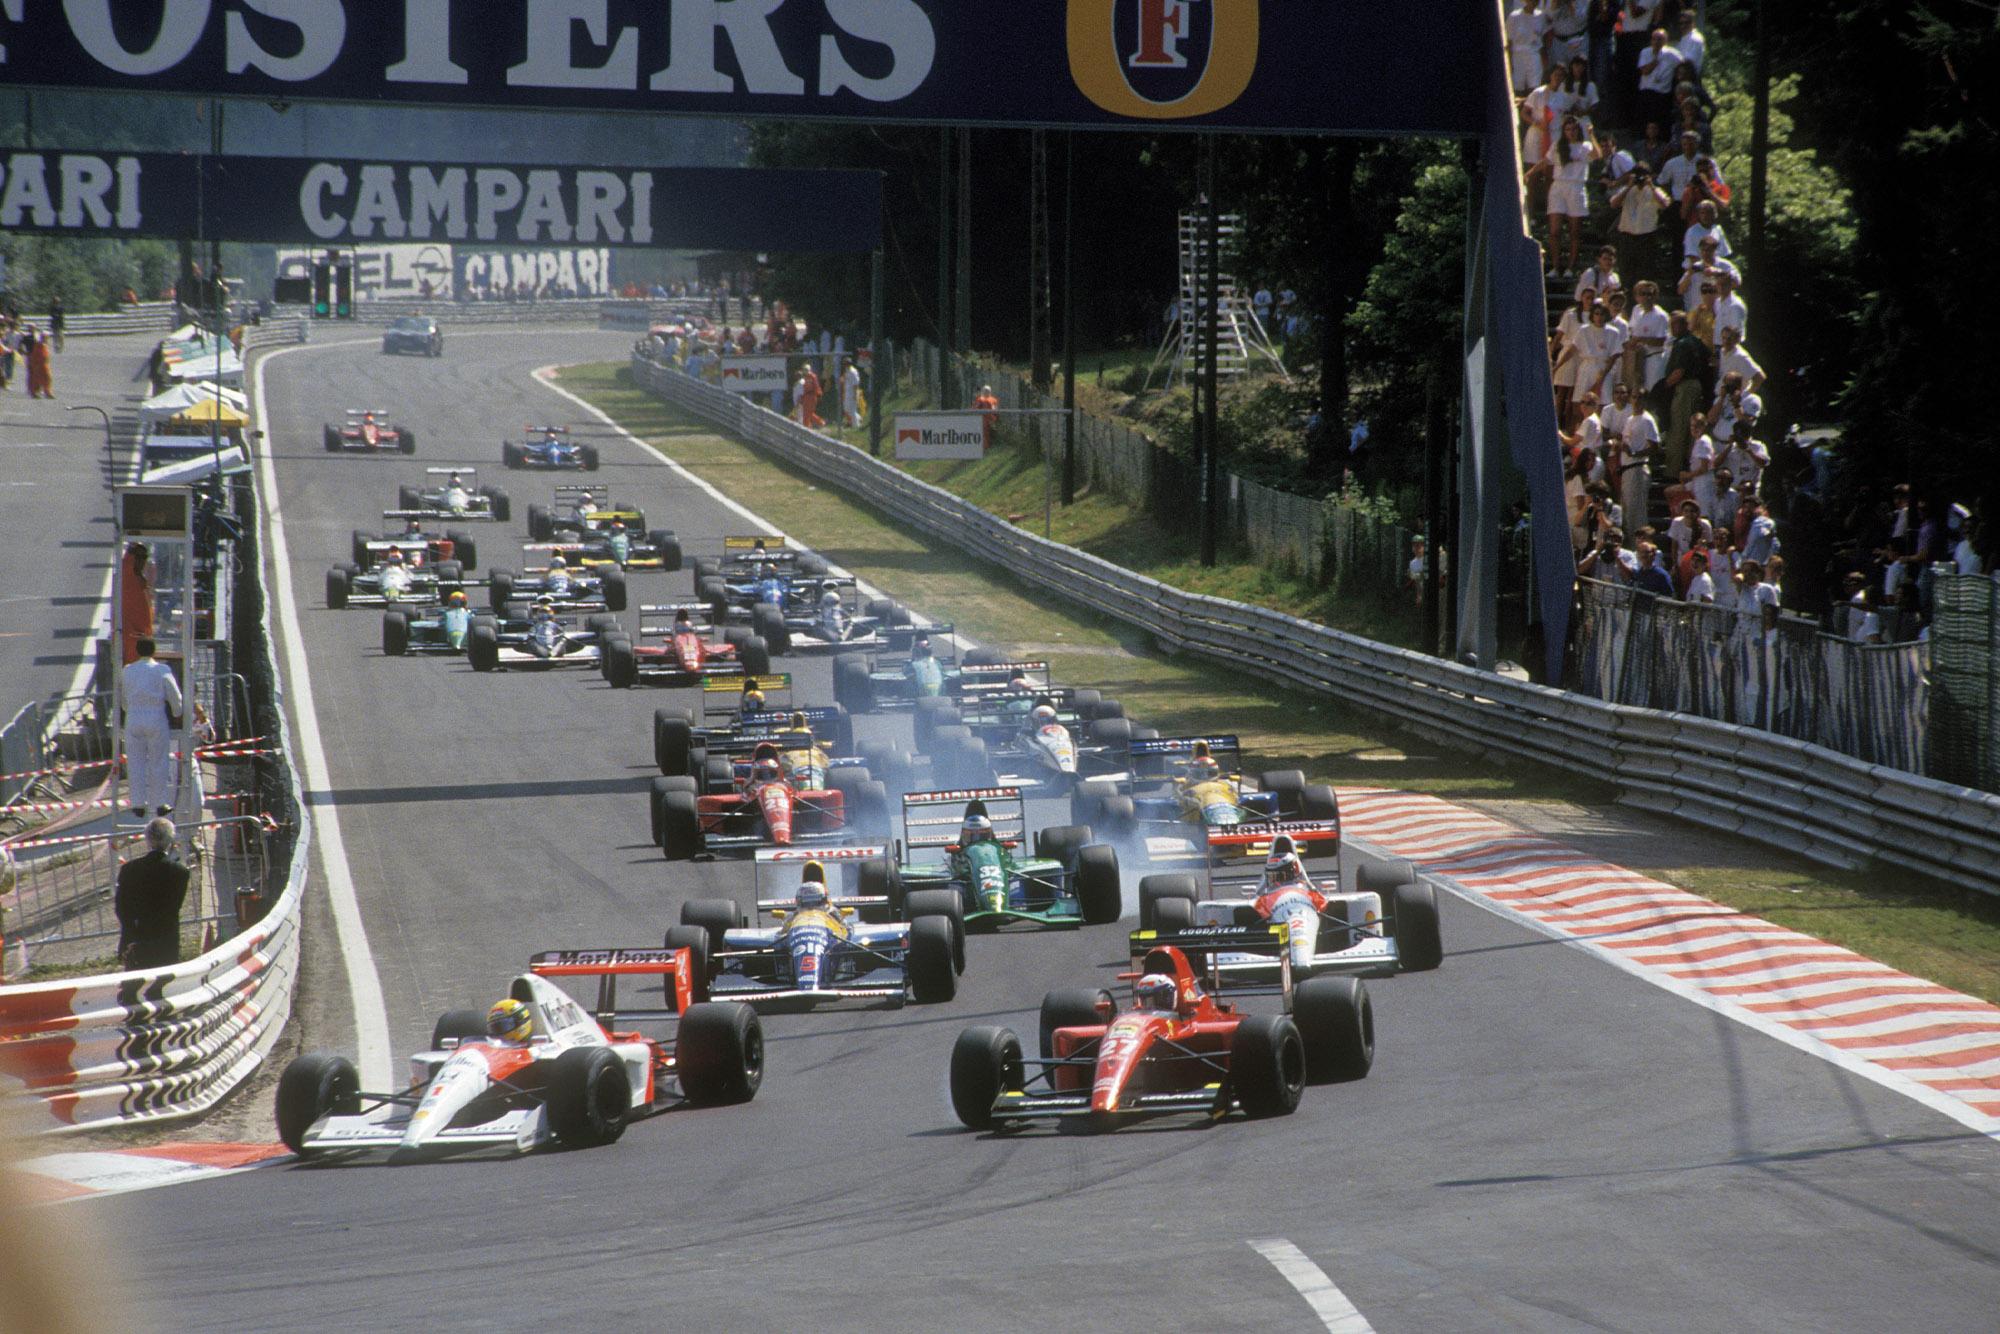 Ayrton Senna leads at the start of the 1991 Belgian Grand Prix